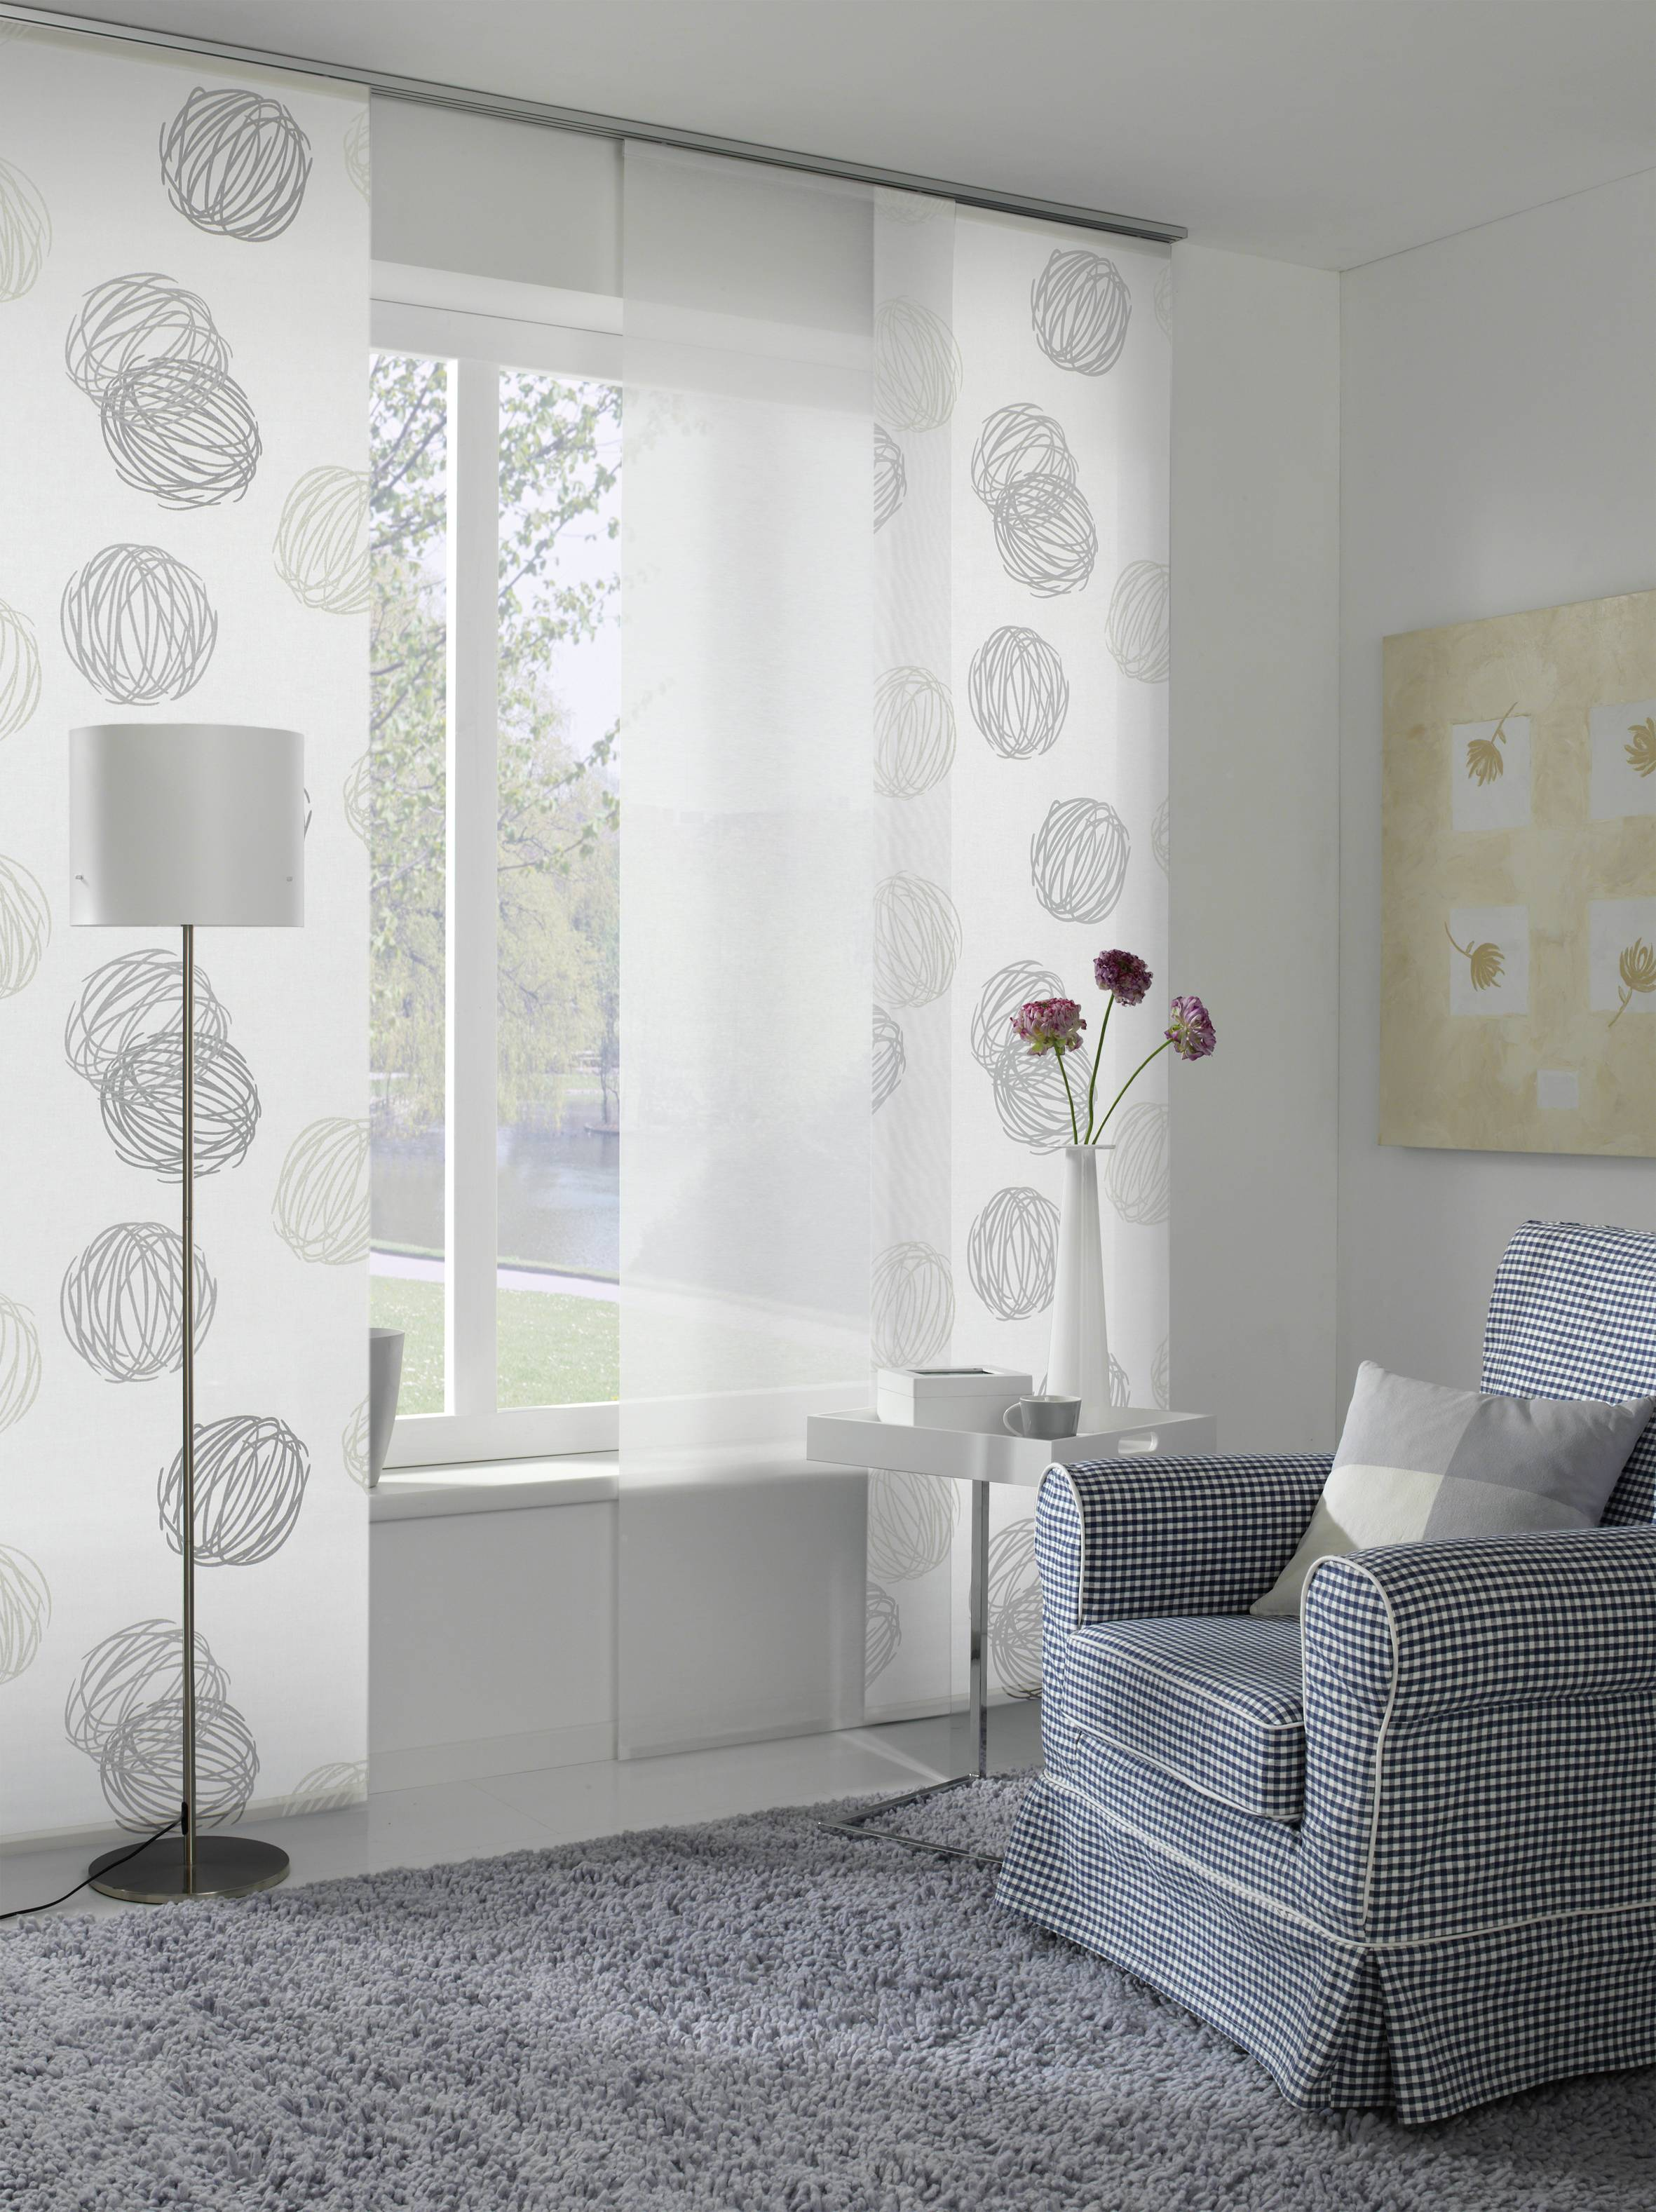 fl chenvorhang stoff kn uel wei grau 60 x 245 cm 1122060245. Black Bedroom Furniture Sets. Home Design Ideas